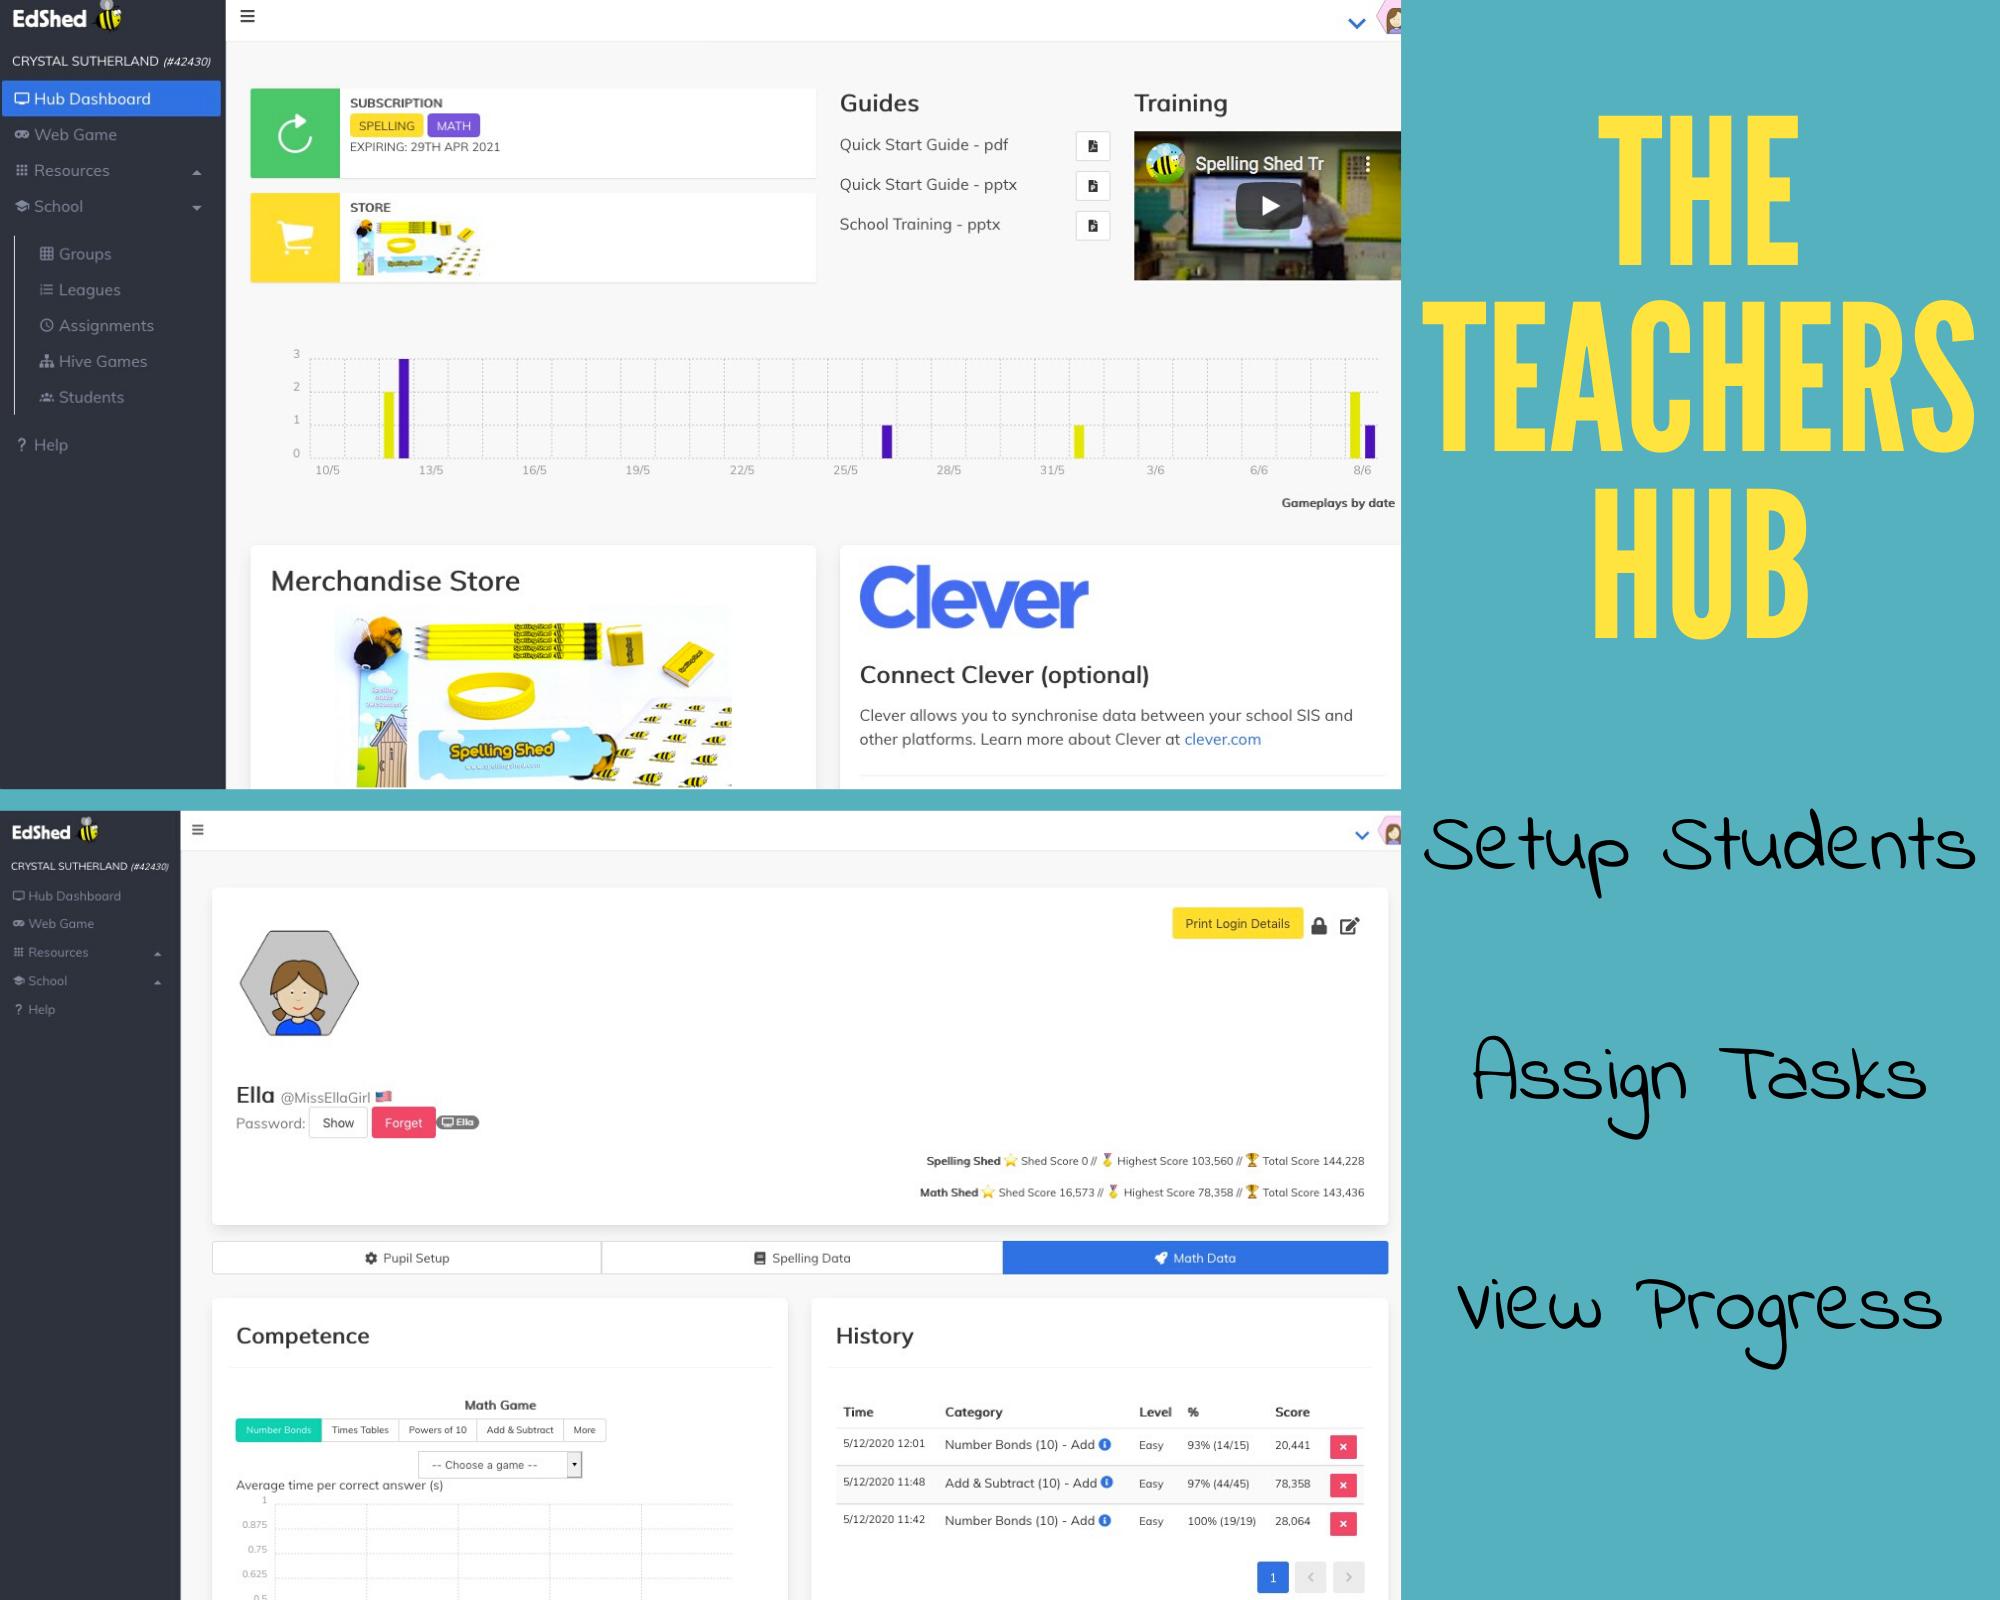 TeachersHub